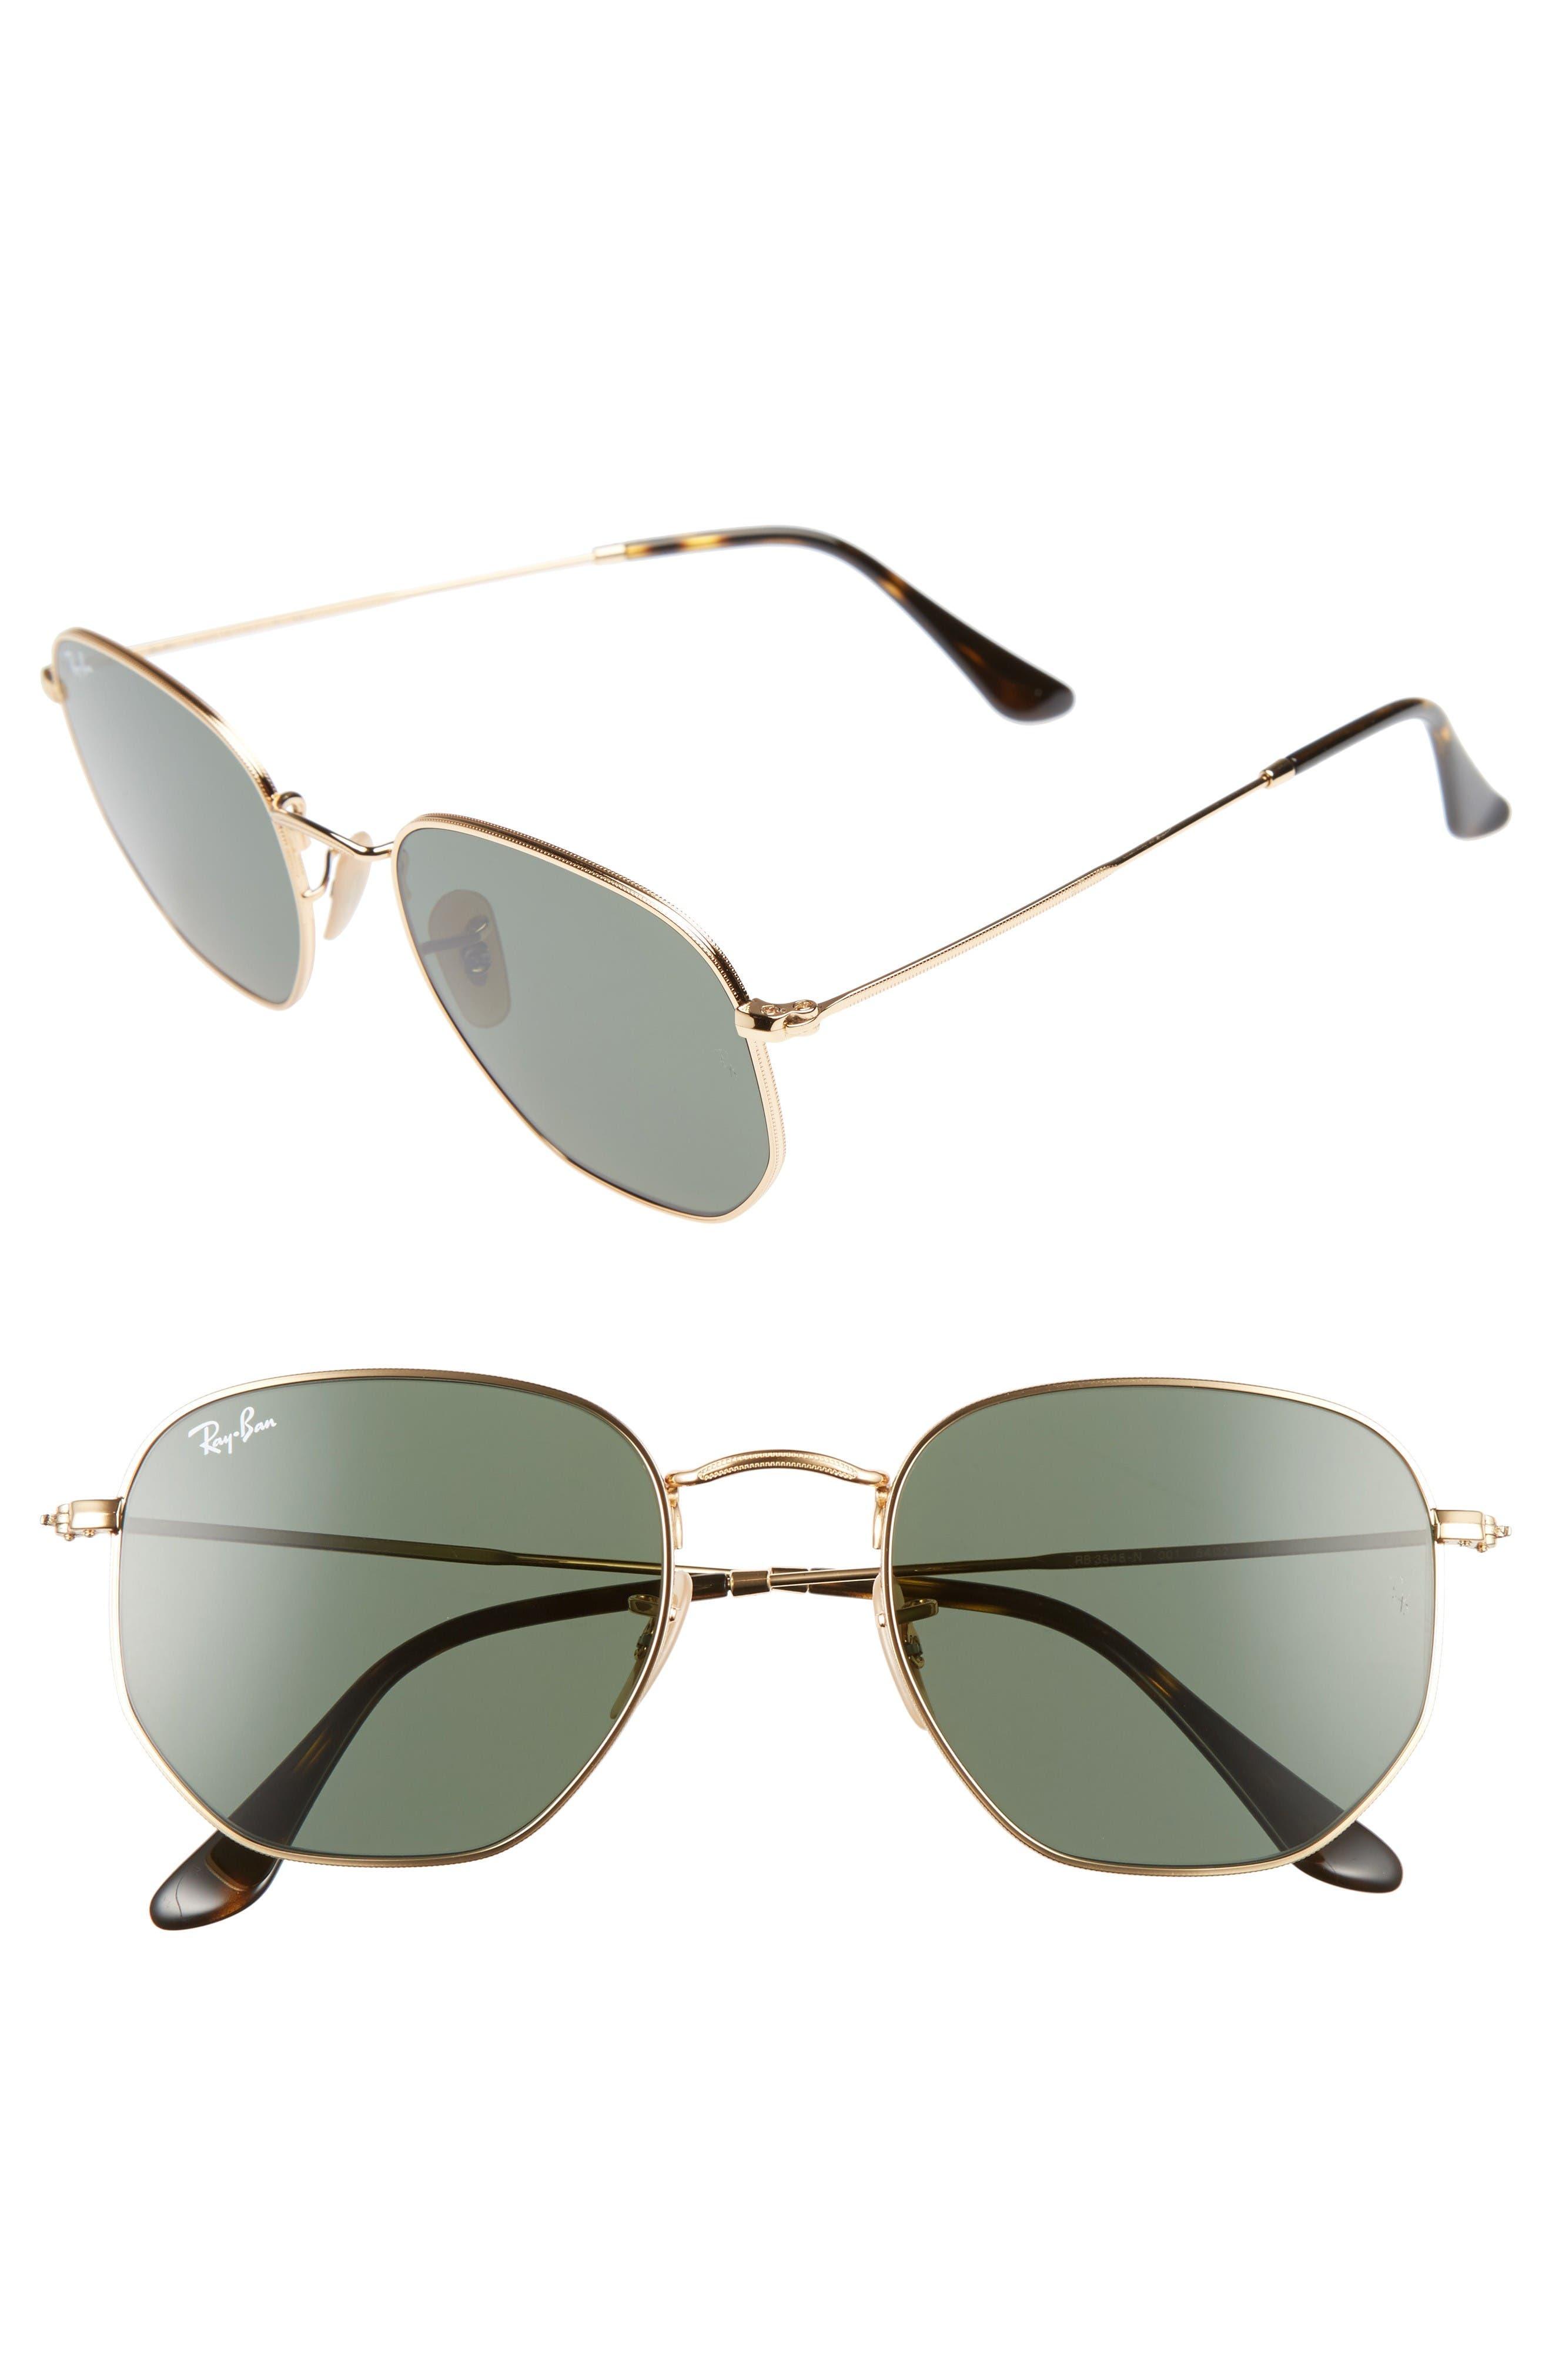 Main Image - Ray-Ban 54mm Aviator Sunglasses